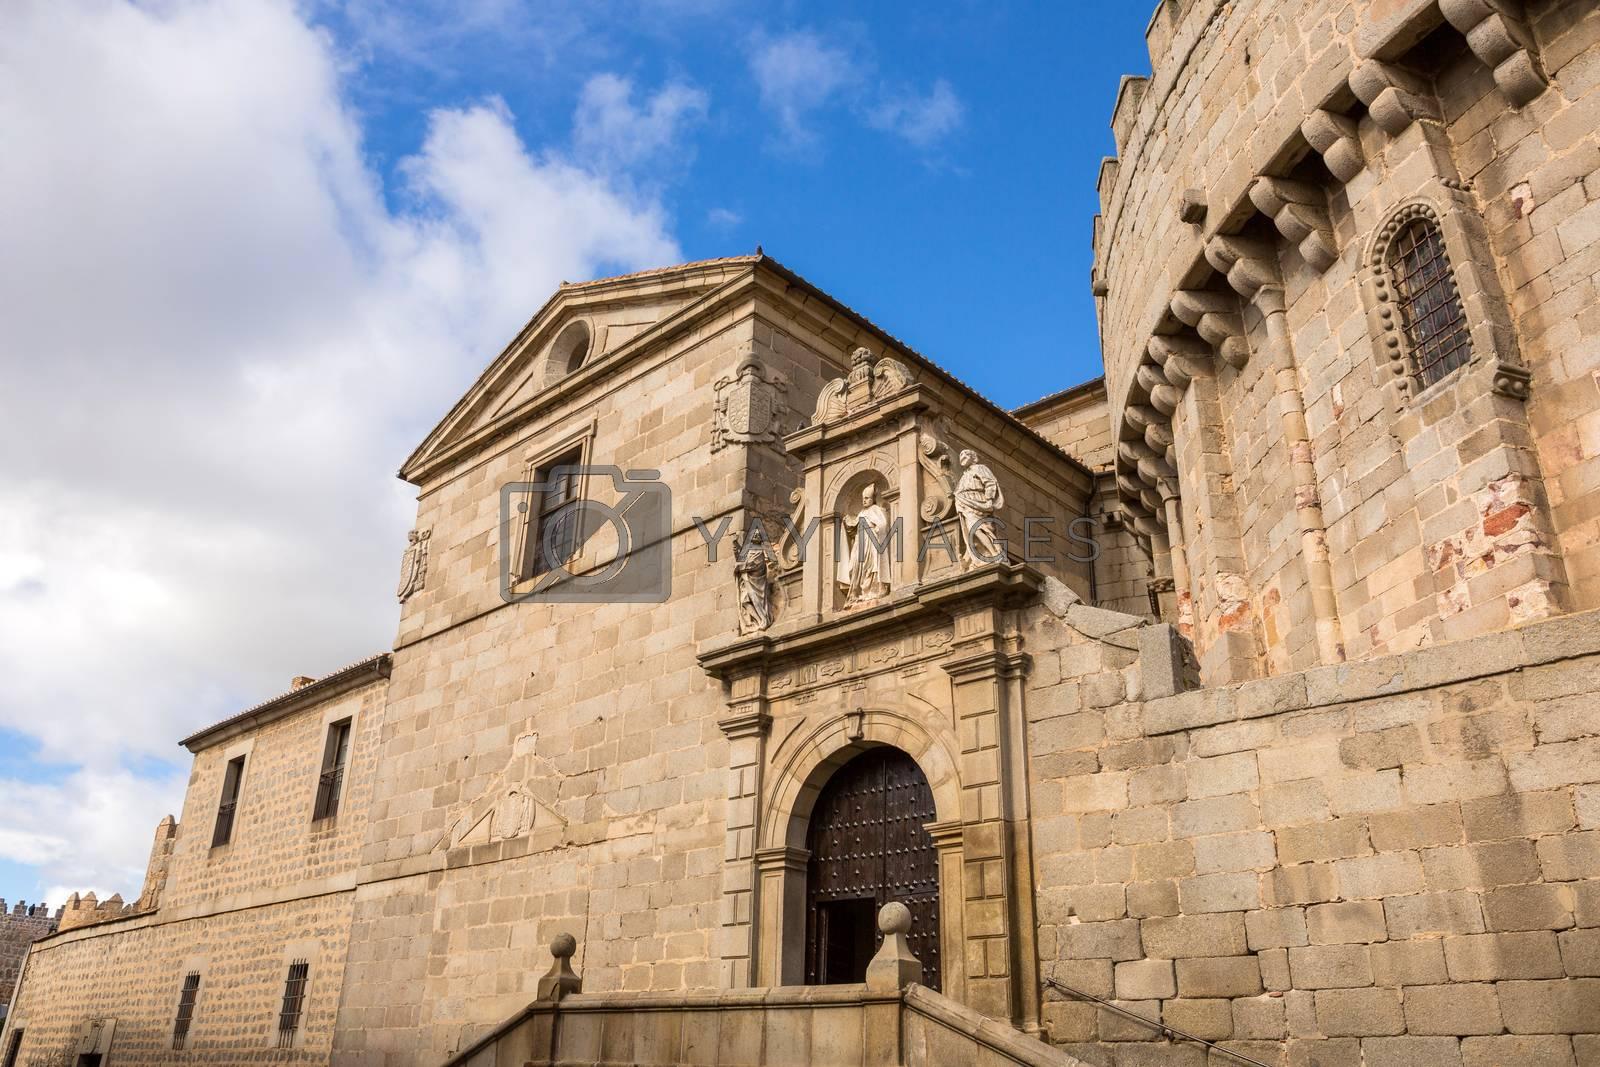 The famous Avila cathedral, Castilla y Leon, Spain.